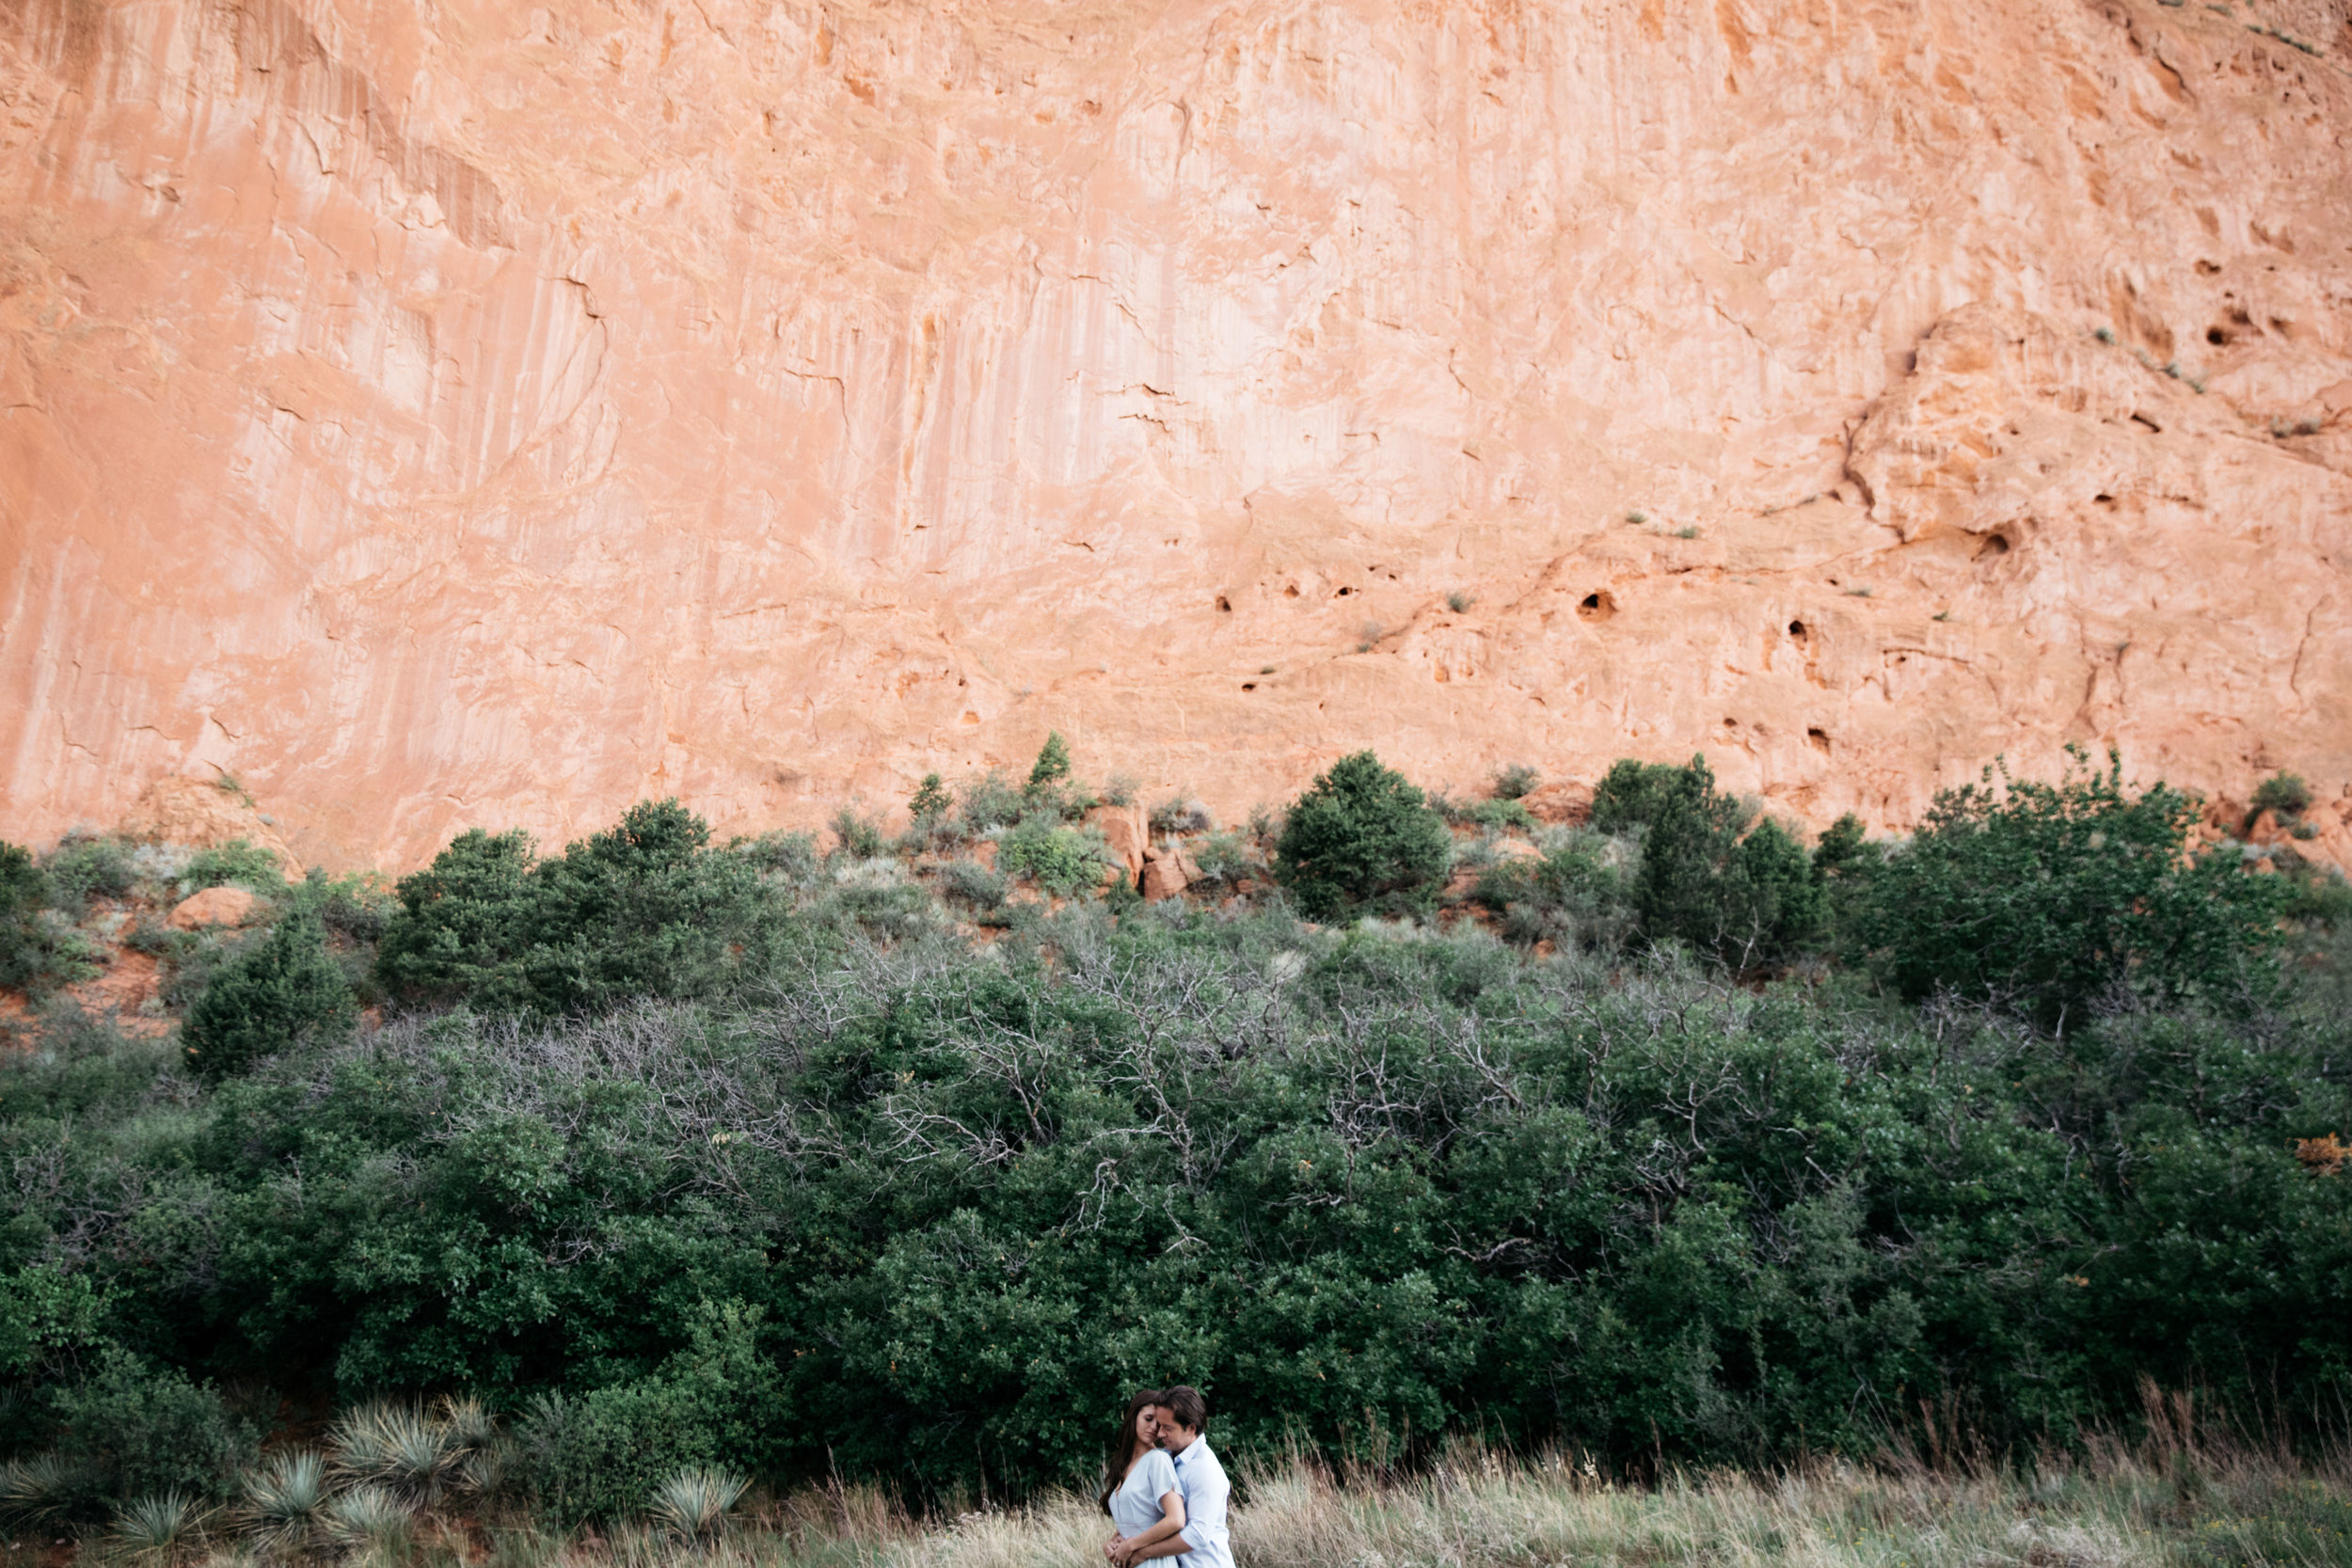 broadmoor-engagement-photography-171.jpg